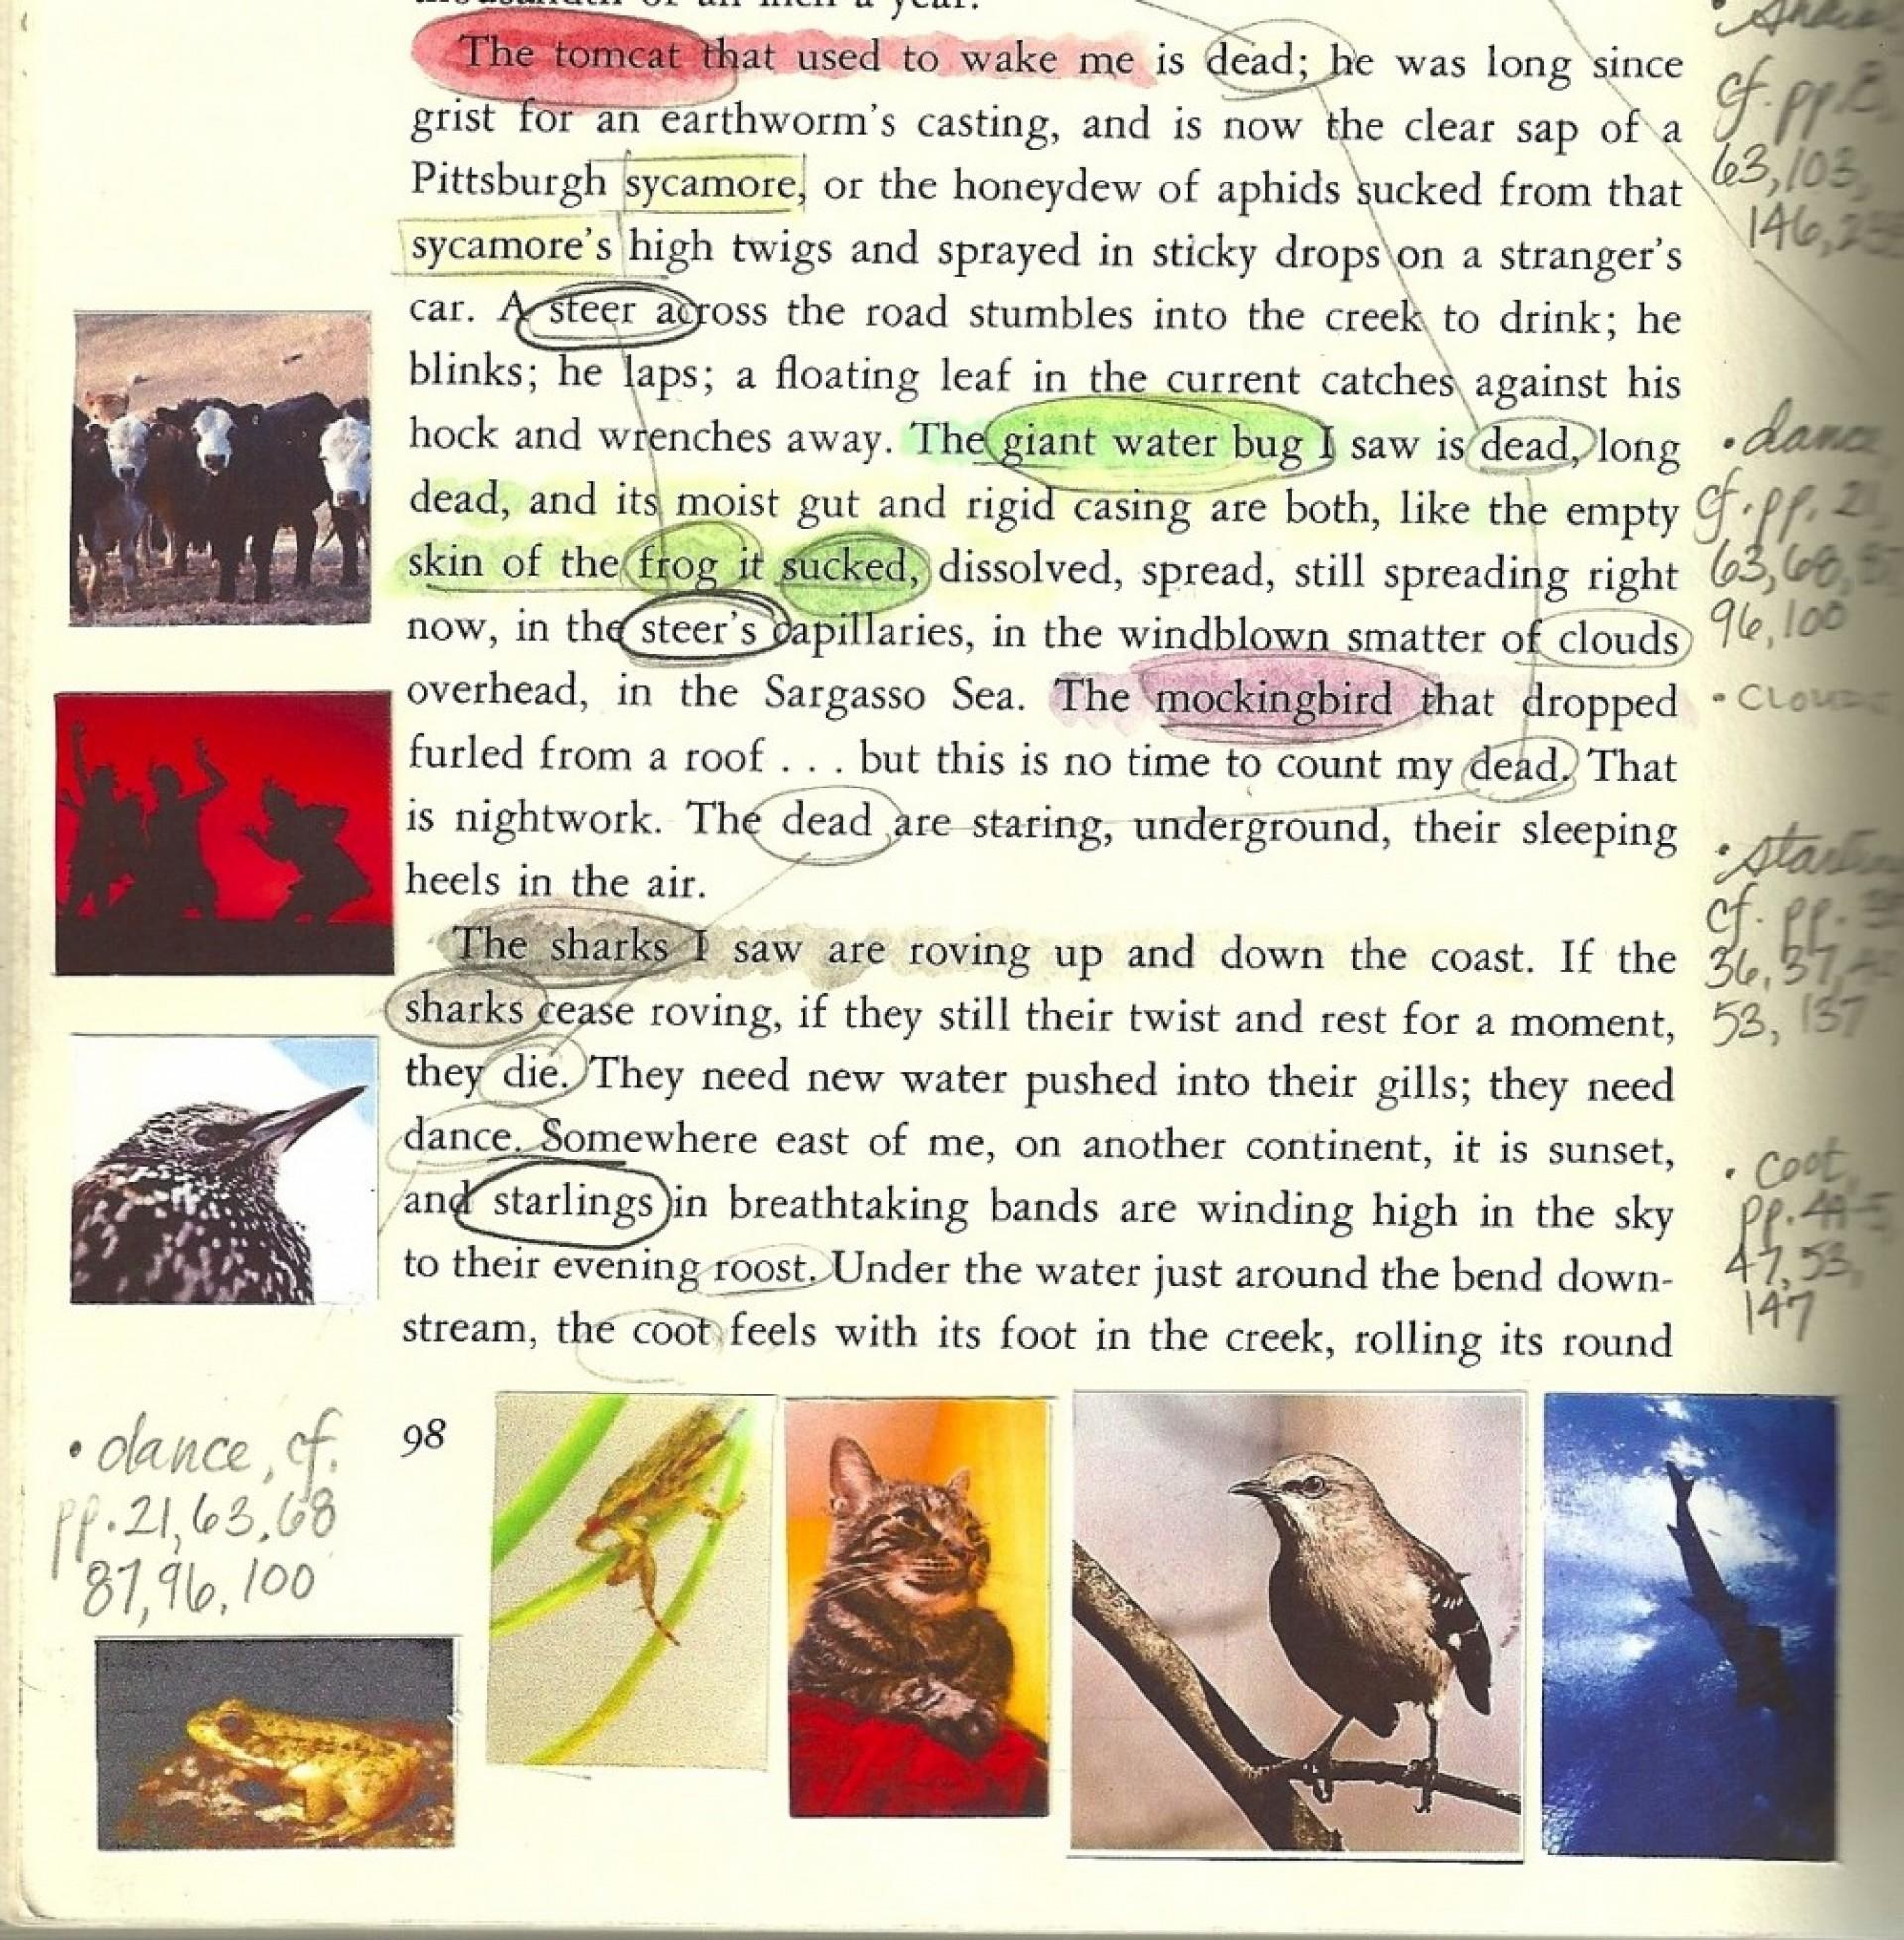 015 Pilgrim Page 1005x1024 Essay Example Annie Dillard Stirring Essays Stunt Pilot Pdf An American Childhood 1920